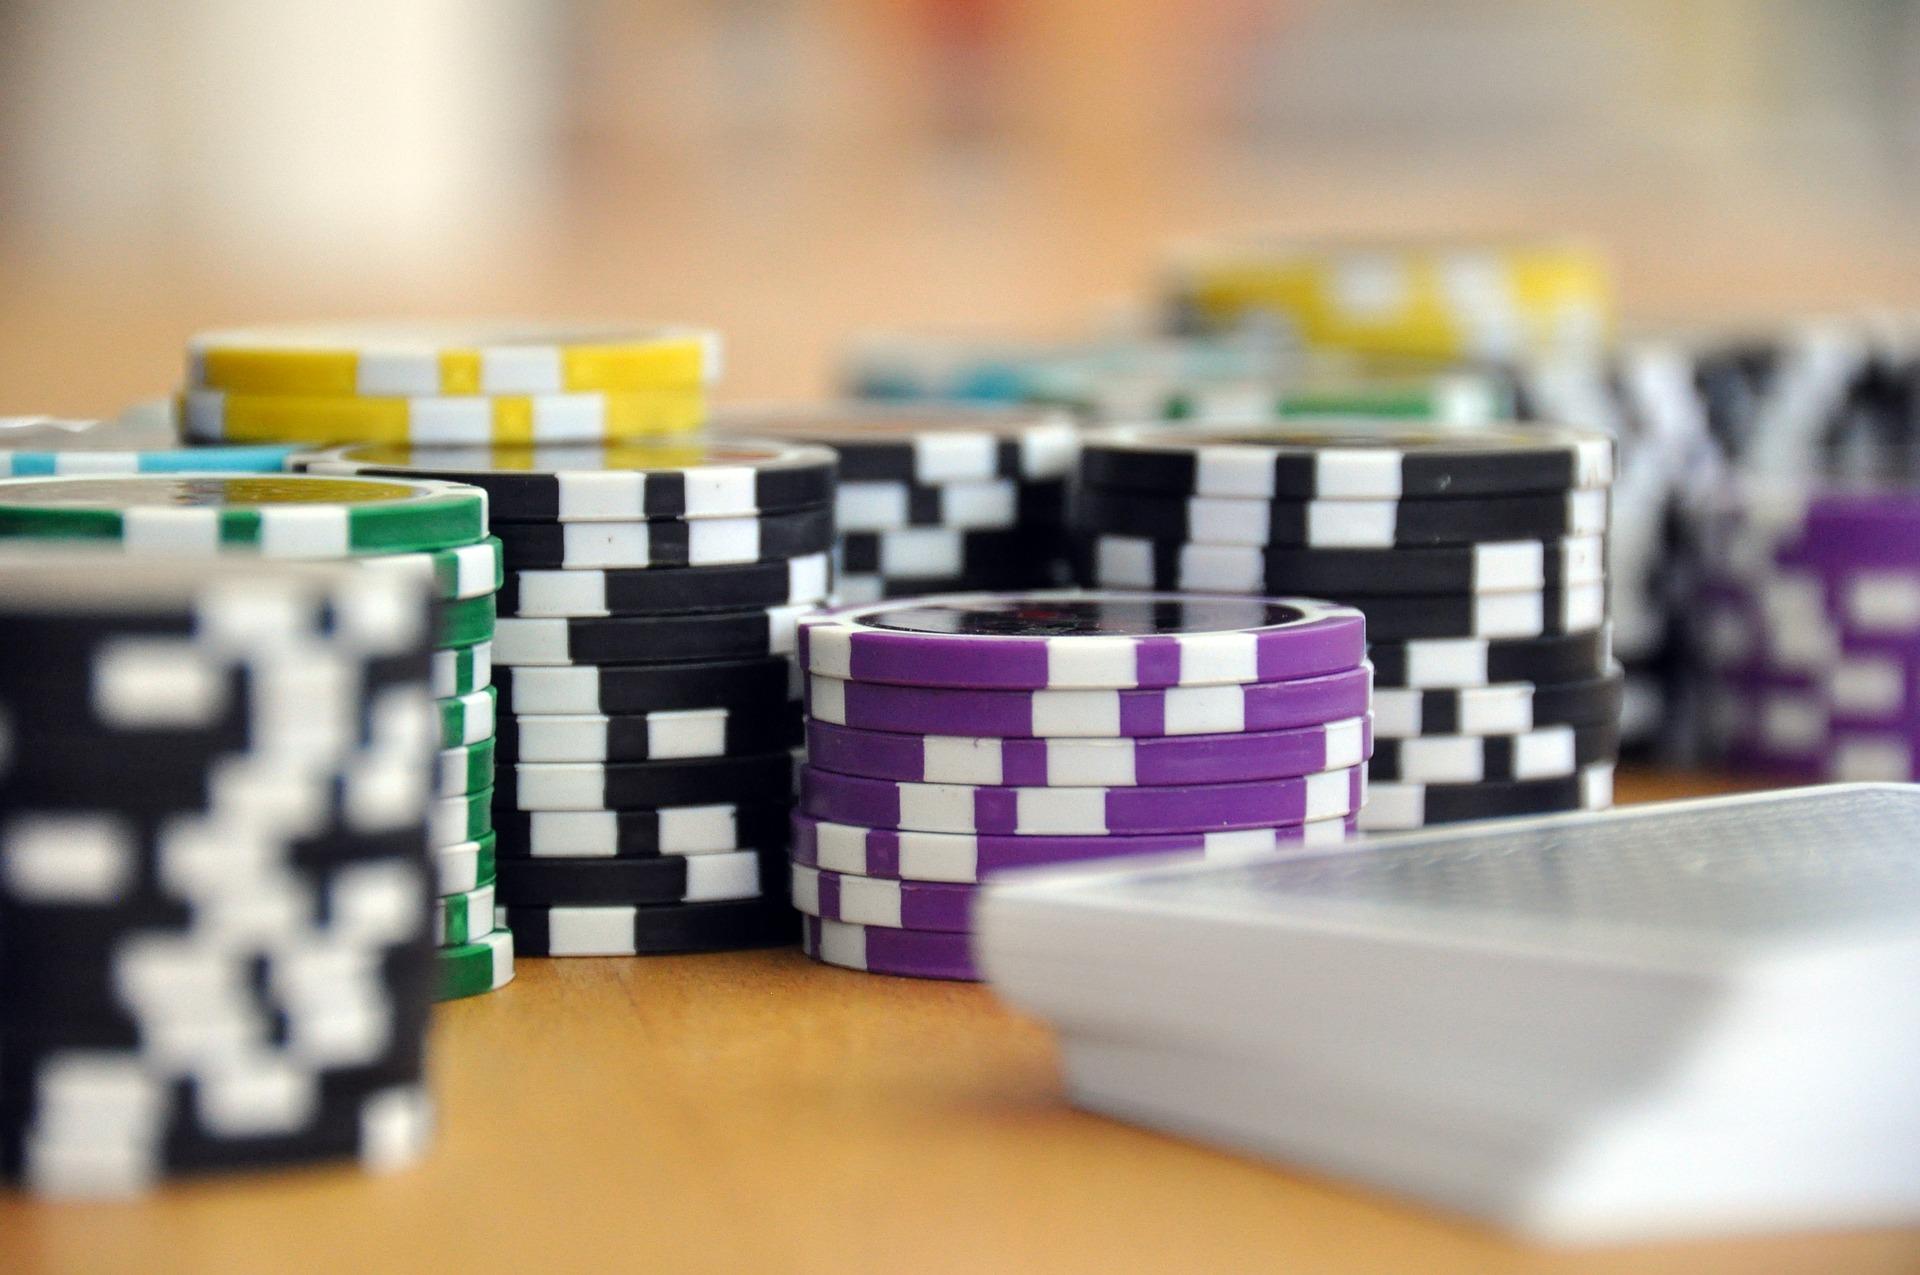 Registerkarten, Spiel, Kasino, Briefe, Poker - Wallpaper HD - Prof.-falken.com